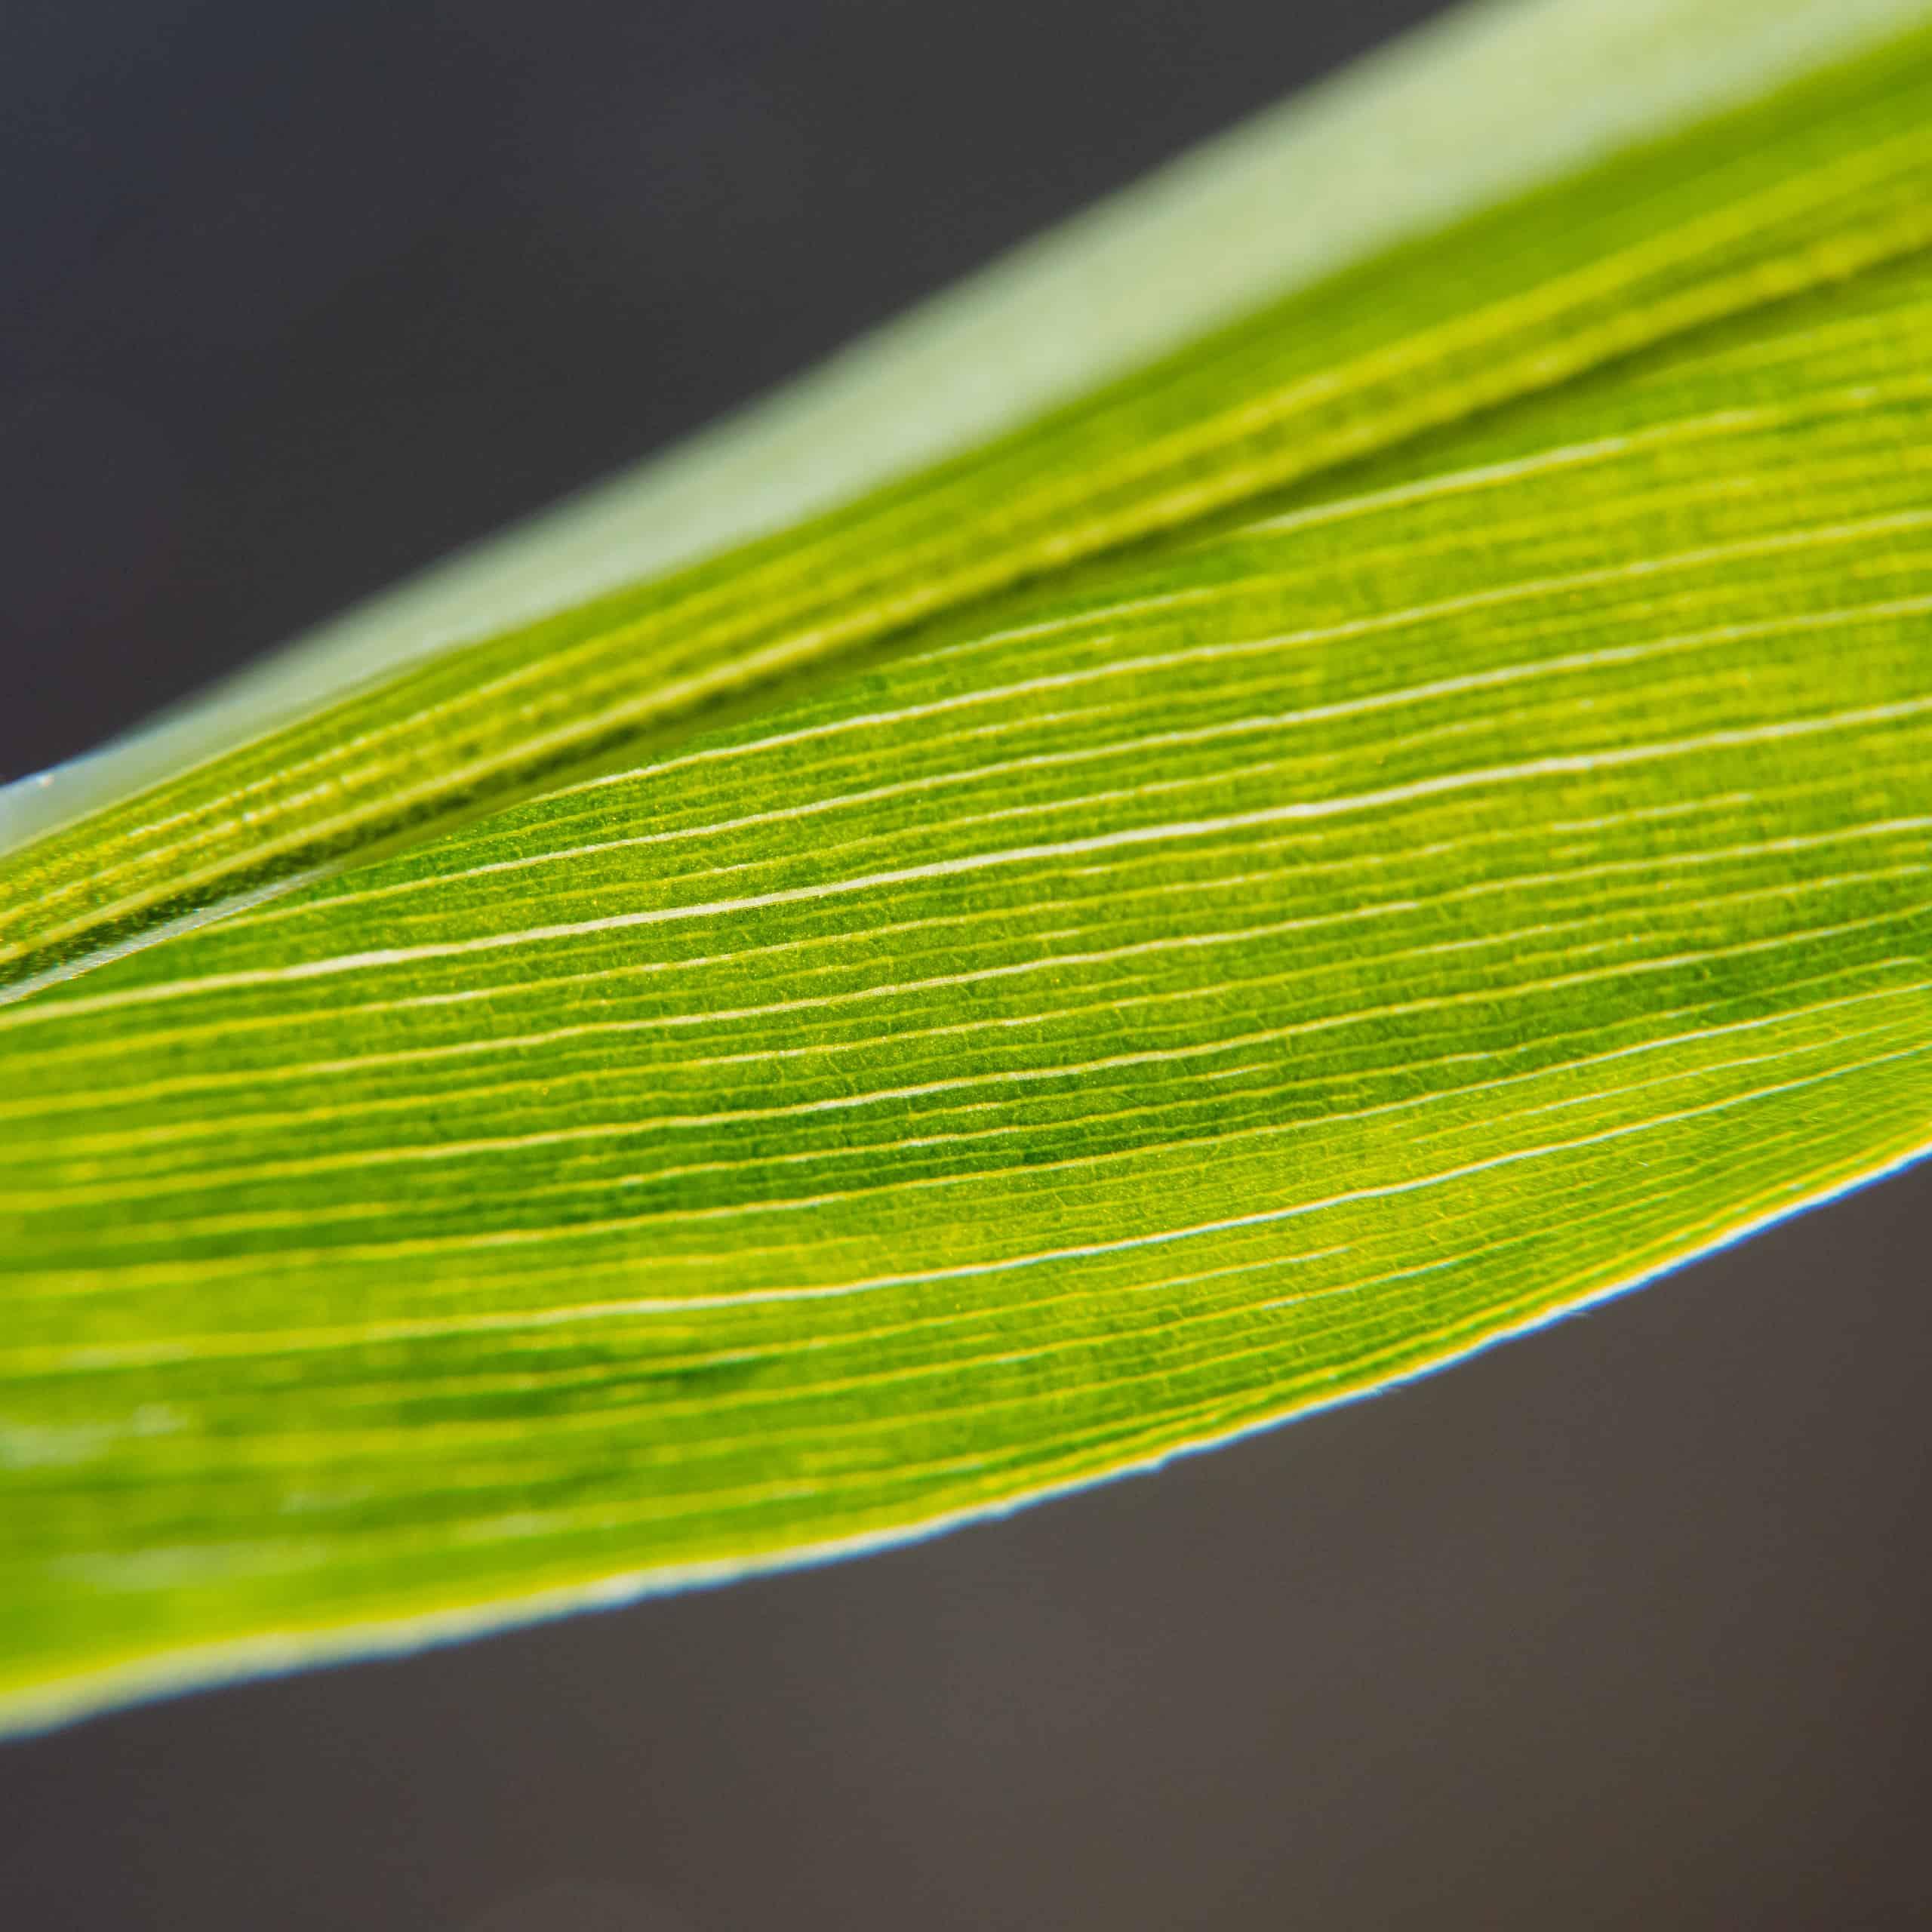 seeds of lockdown leaf